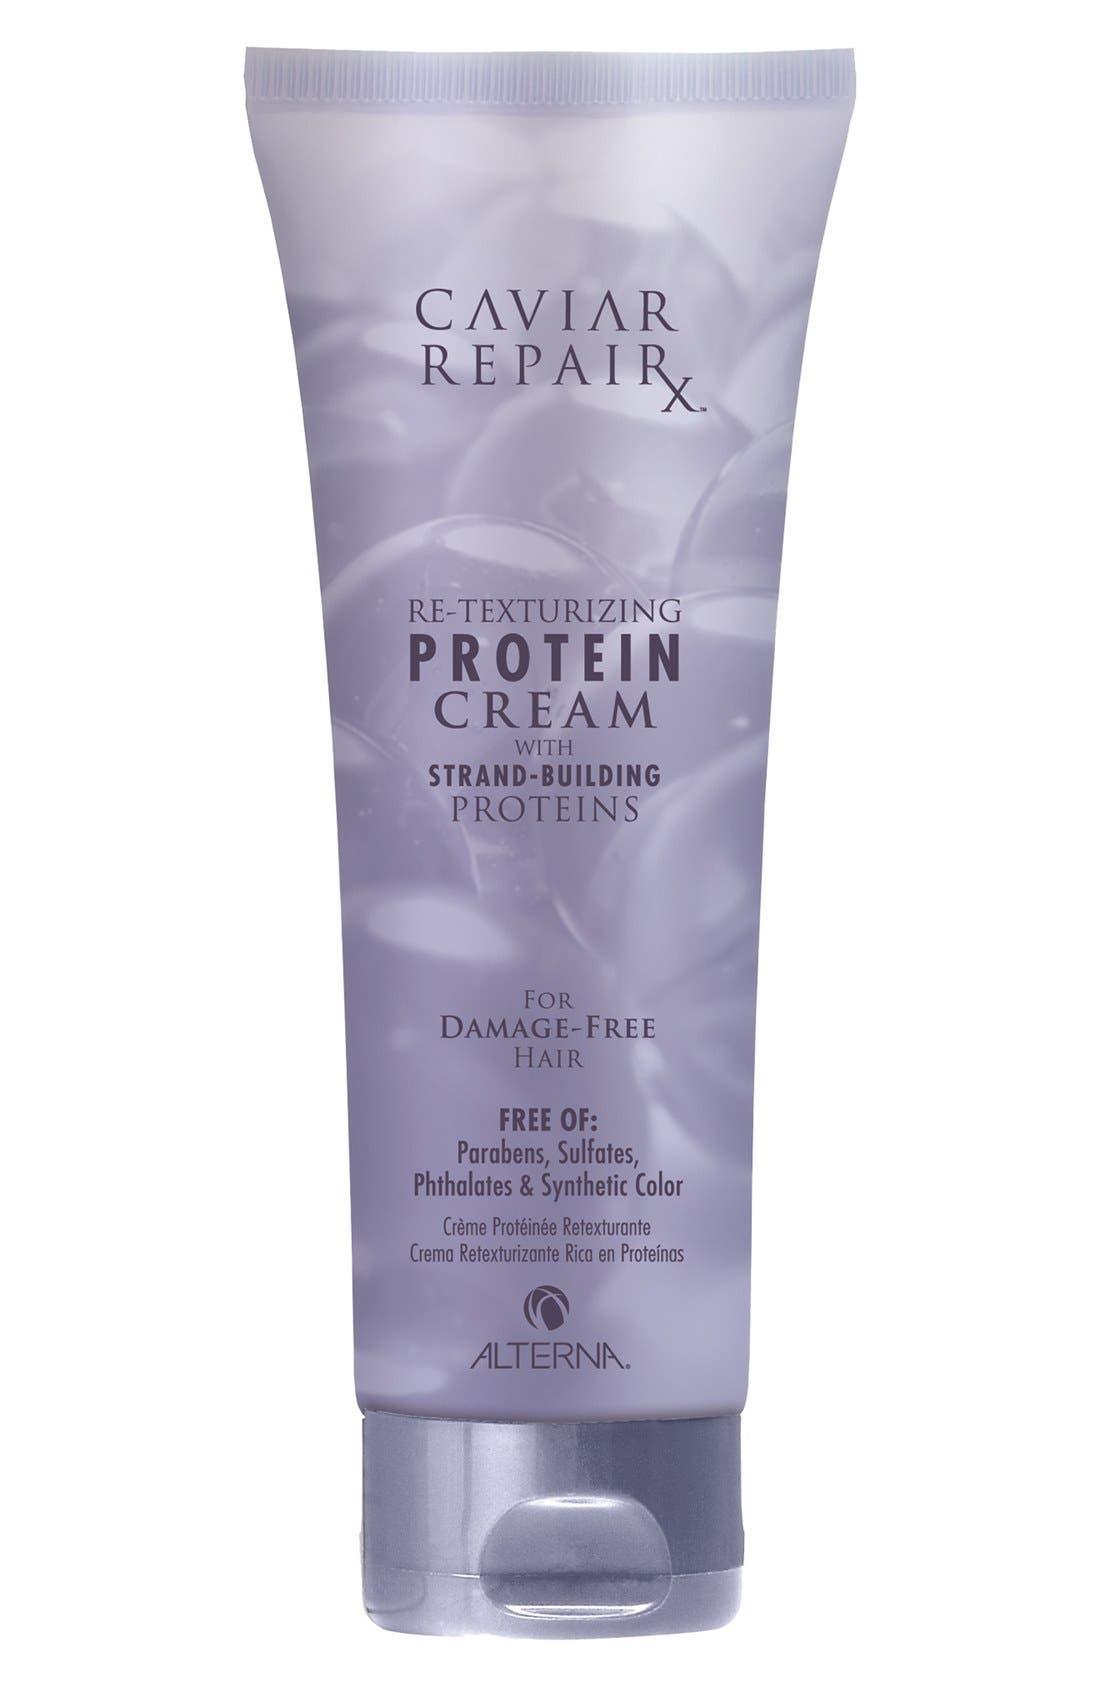 ALTERNA® Caviar Repair Rx Re-Texturizing Protein Cream